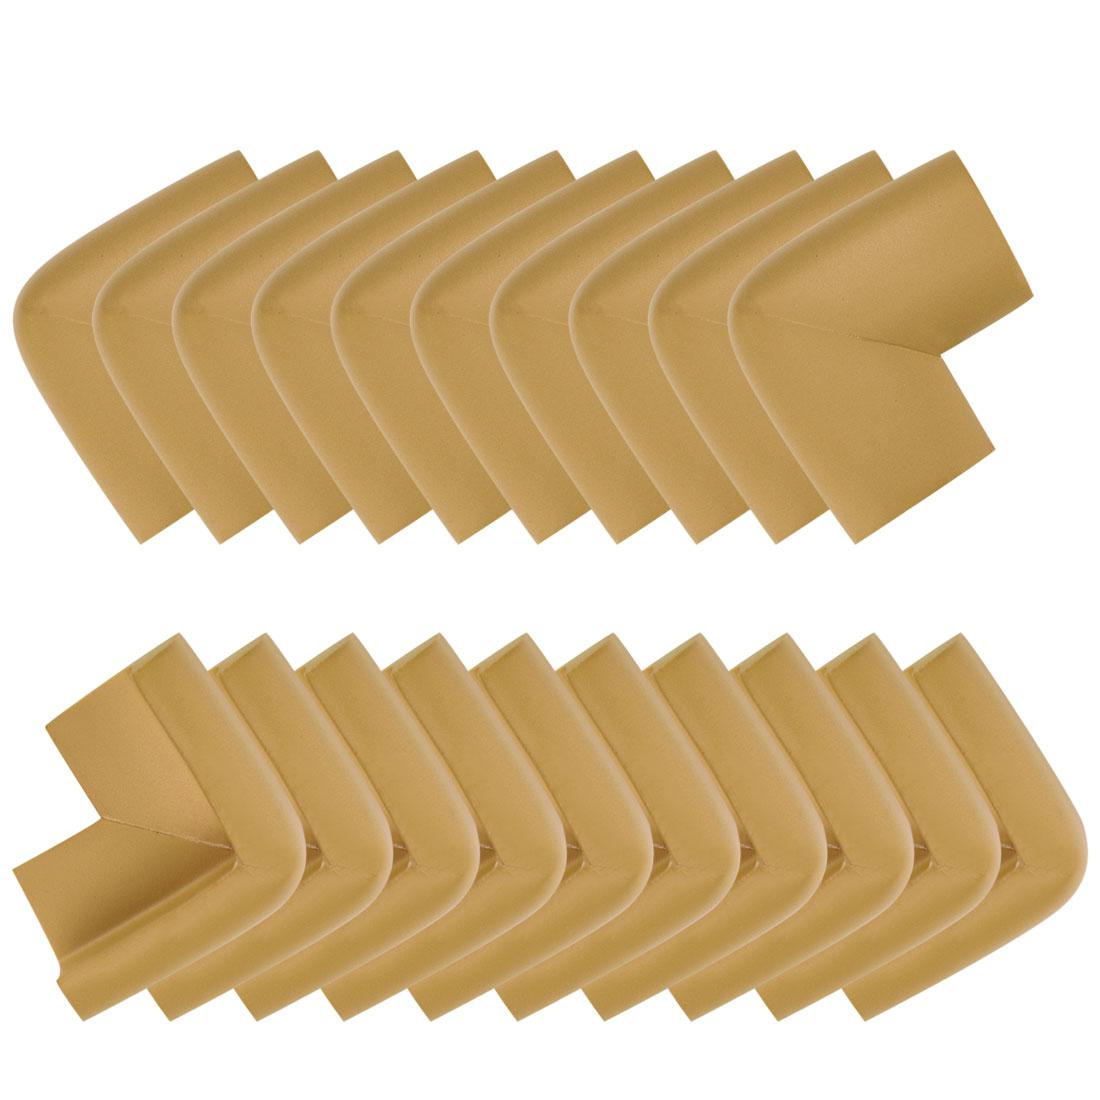 Desk Table Edge Foam Corner Cushion Guards Soft Bumper Protector 20pcs Brown